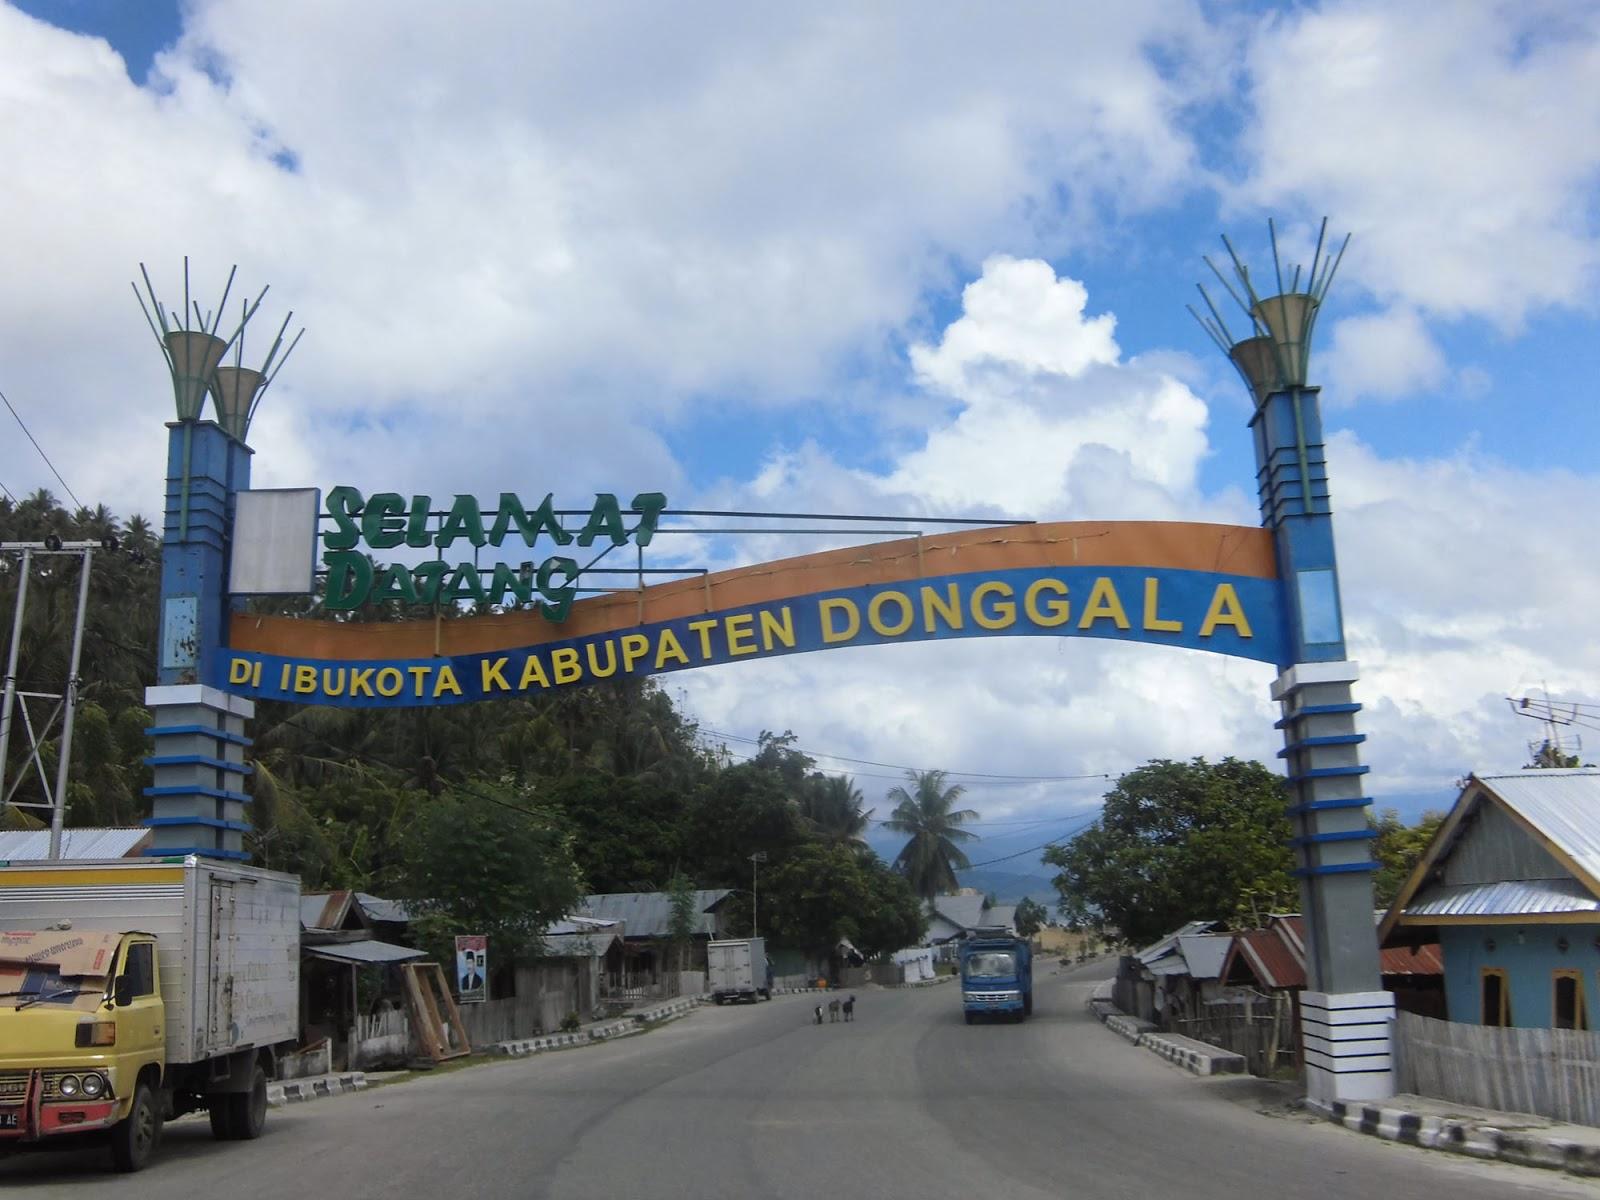 agen-walatra-sehat-mata-softgel-kabupaten-donggala